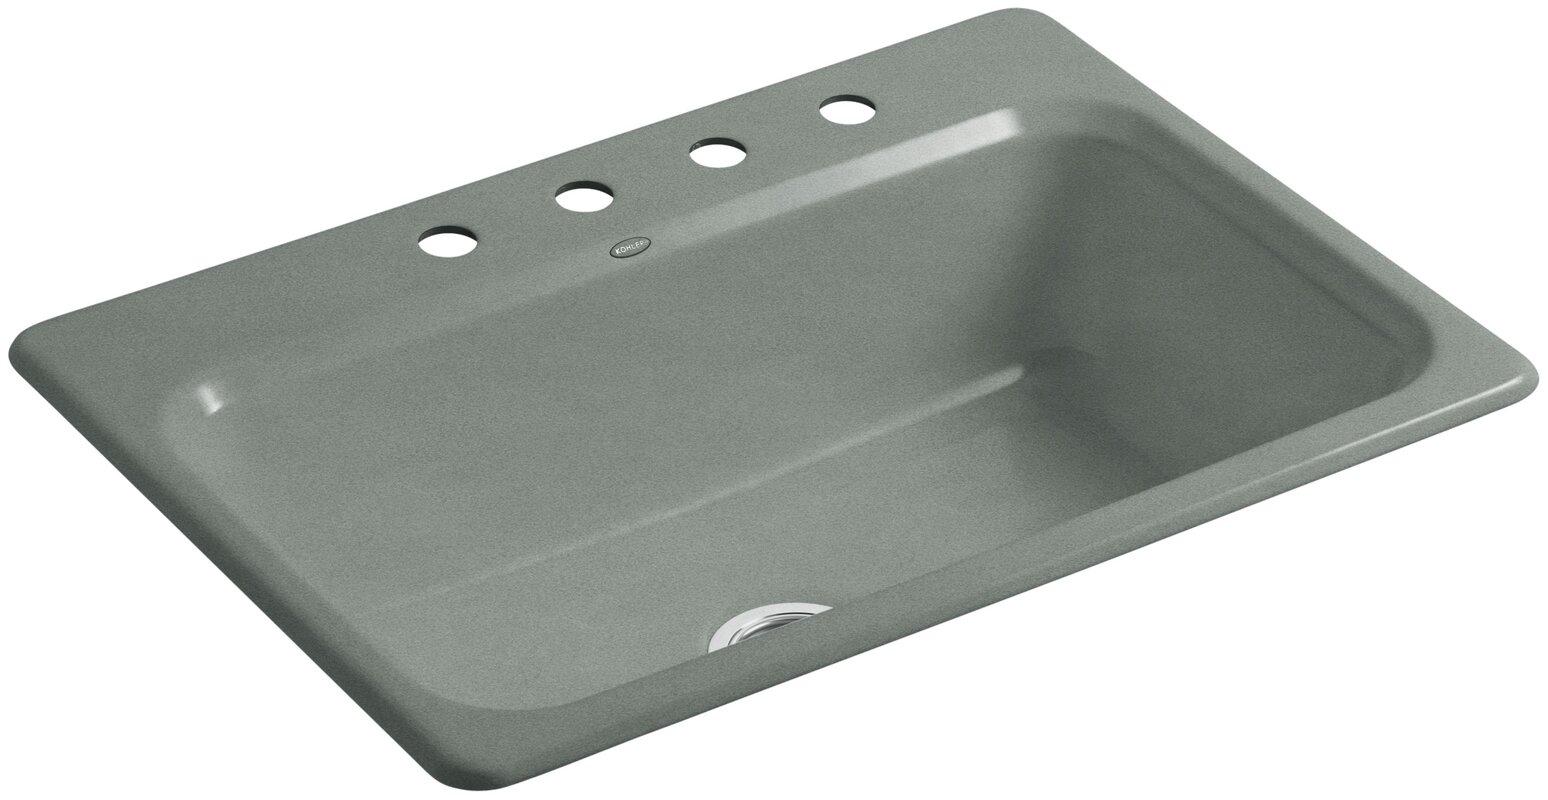 "Bathroom Sinks 31 X 22 kohler bakersfield 31"" x 22"" x 8-5/8"" top-mount single-bowl"